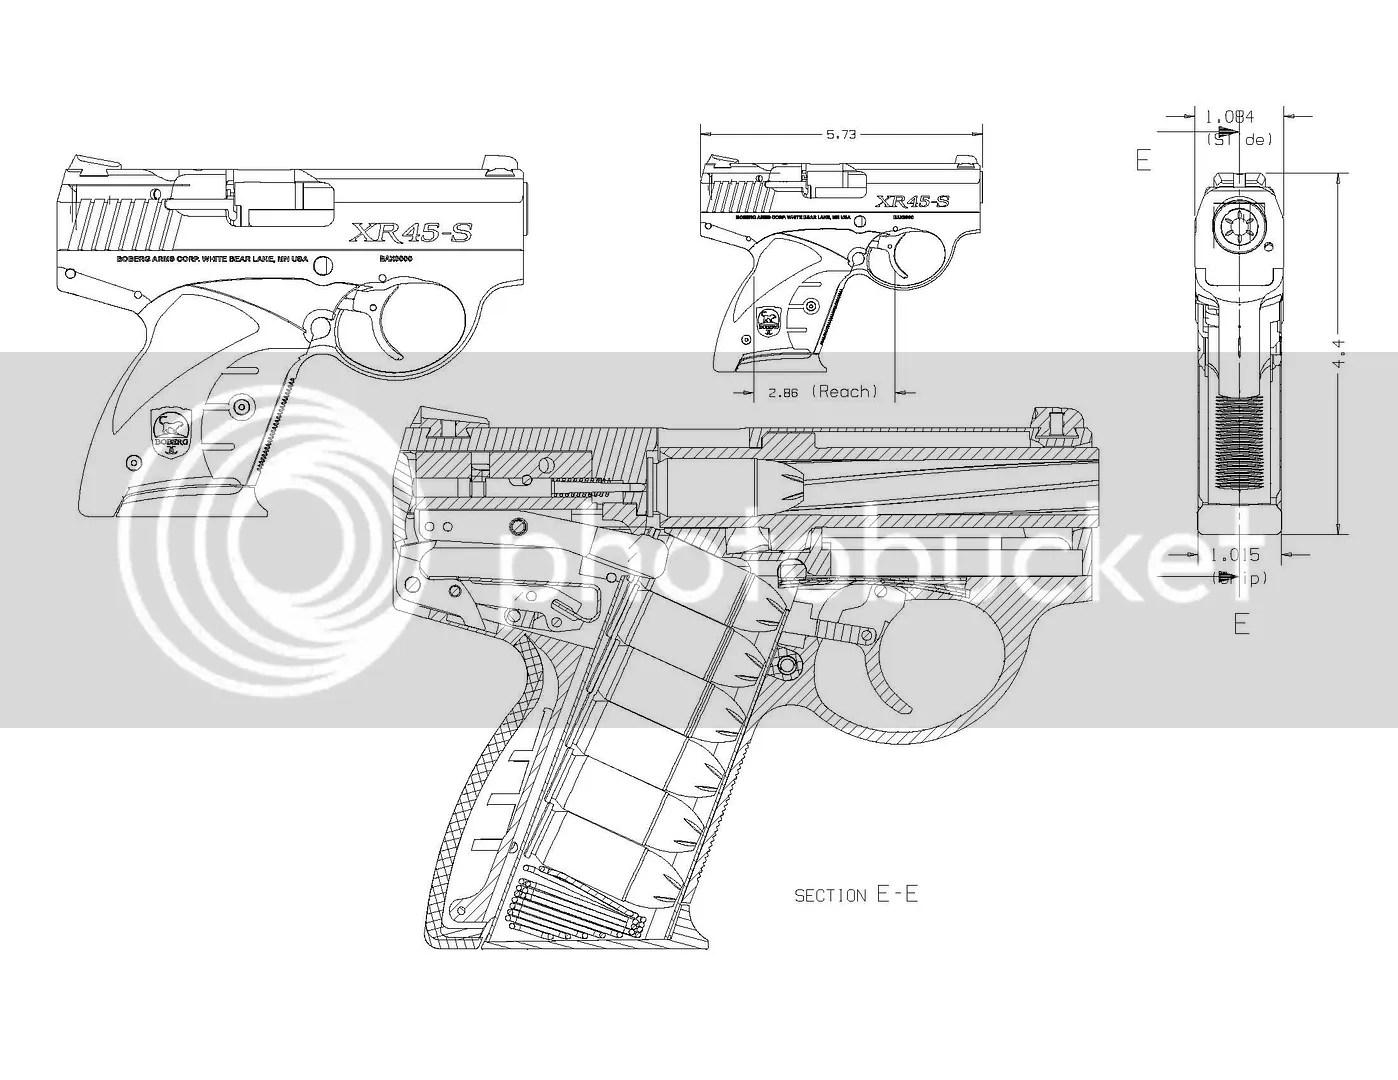 Pocket Guns And Gear A Sneak Peek At The Boberg 45 Acp Xr45 S